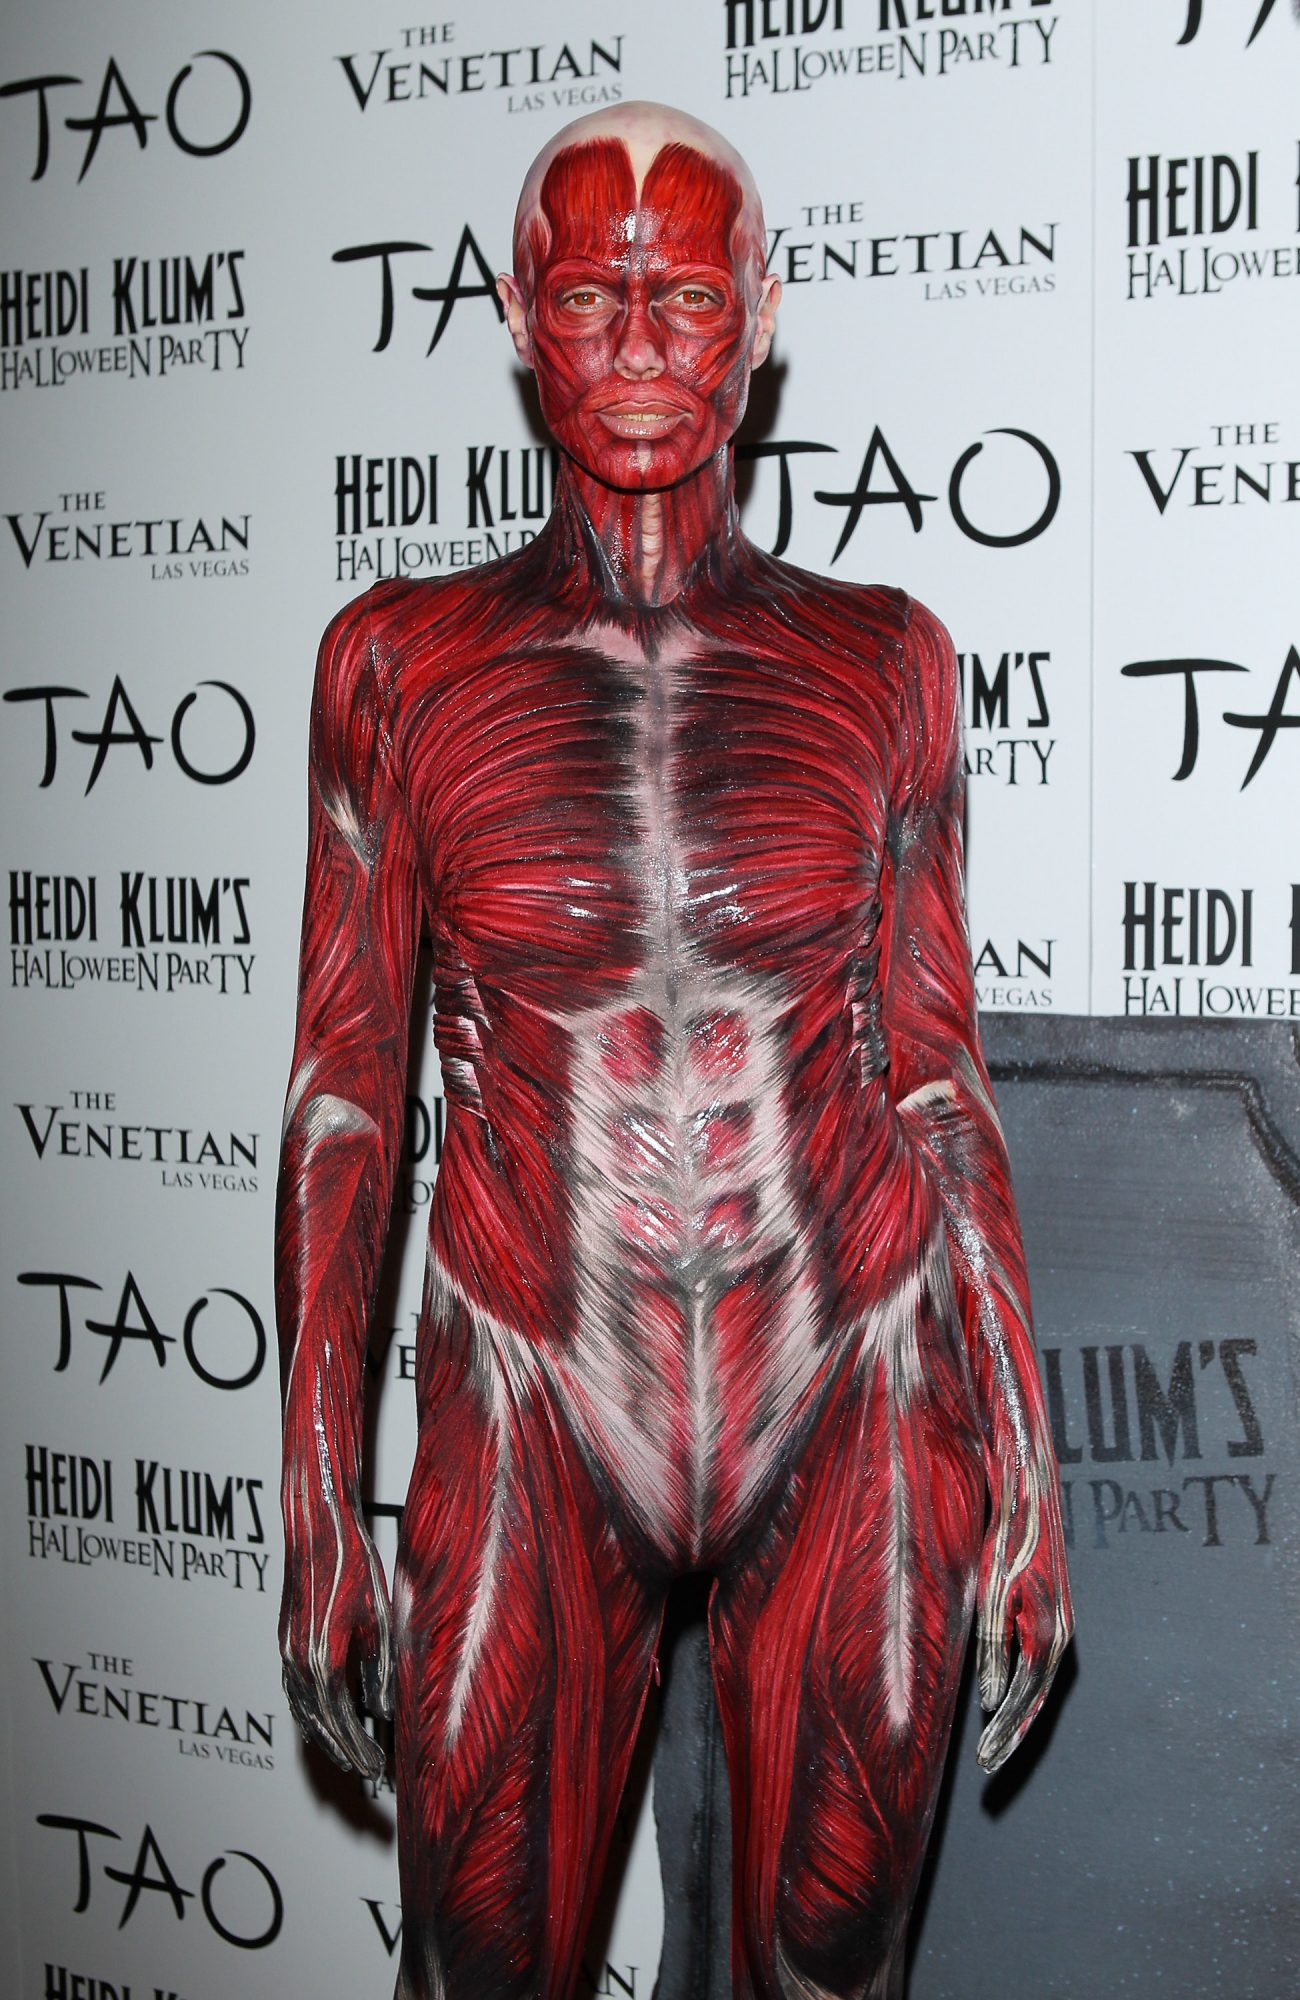 LAS VEGAS, NV - OCTOBER 29:  Heidi Klum arrives at her 12th Annual Halloween Party at TAO Nightclub at The Venetian on October 29, 2011 in Las Vegas, Nevada.  (Photo by Michael Tran/FilmMagic)